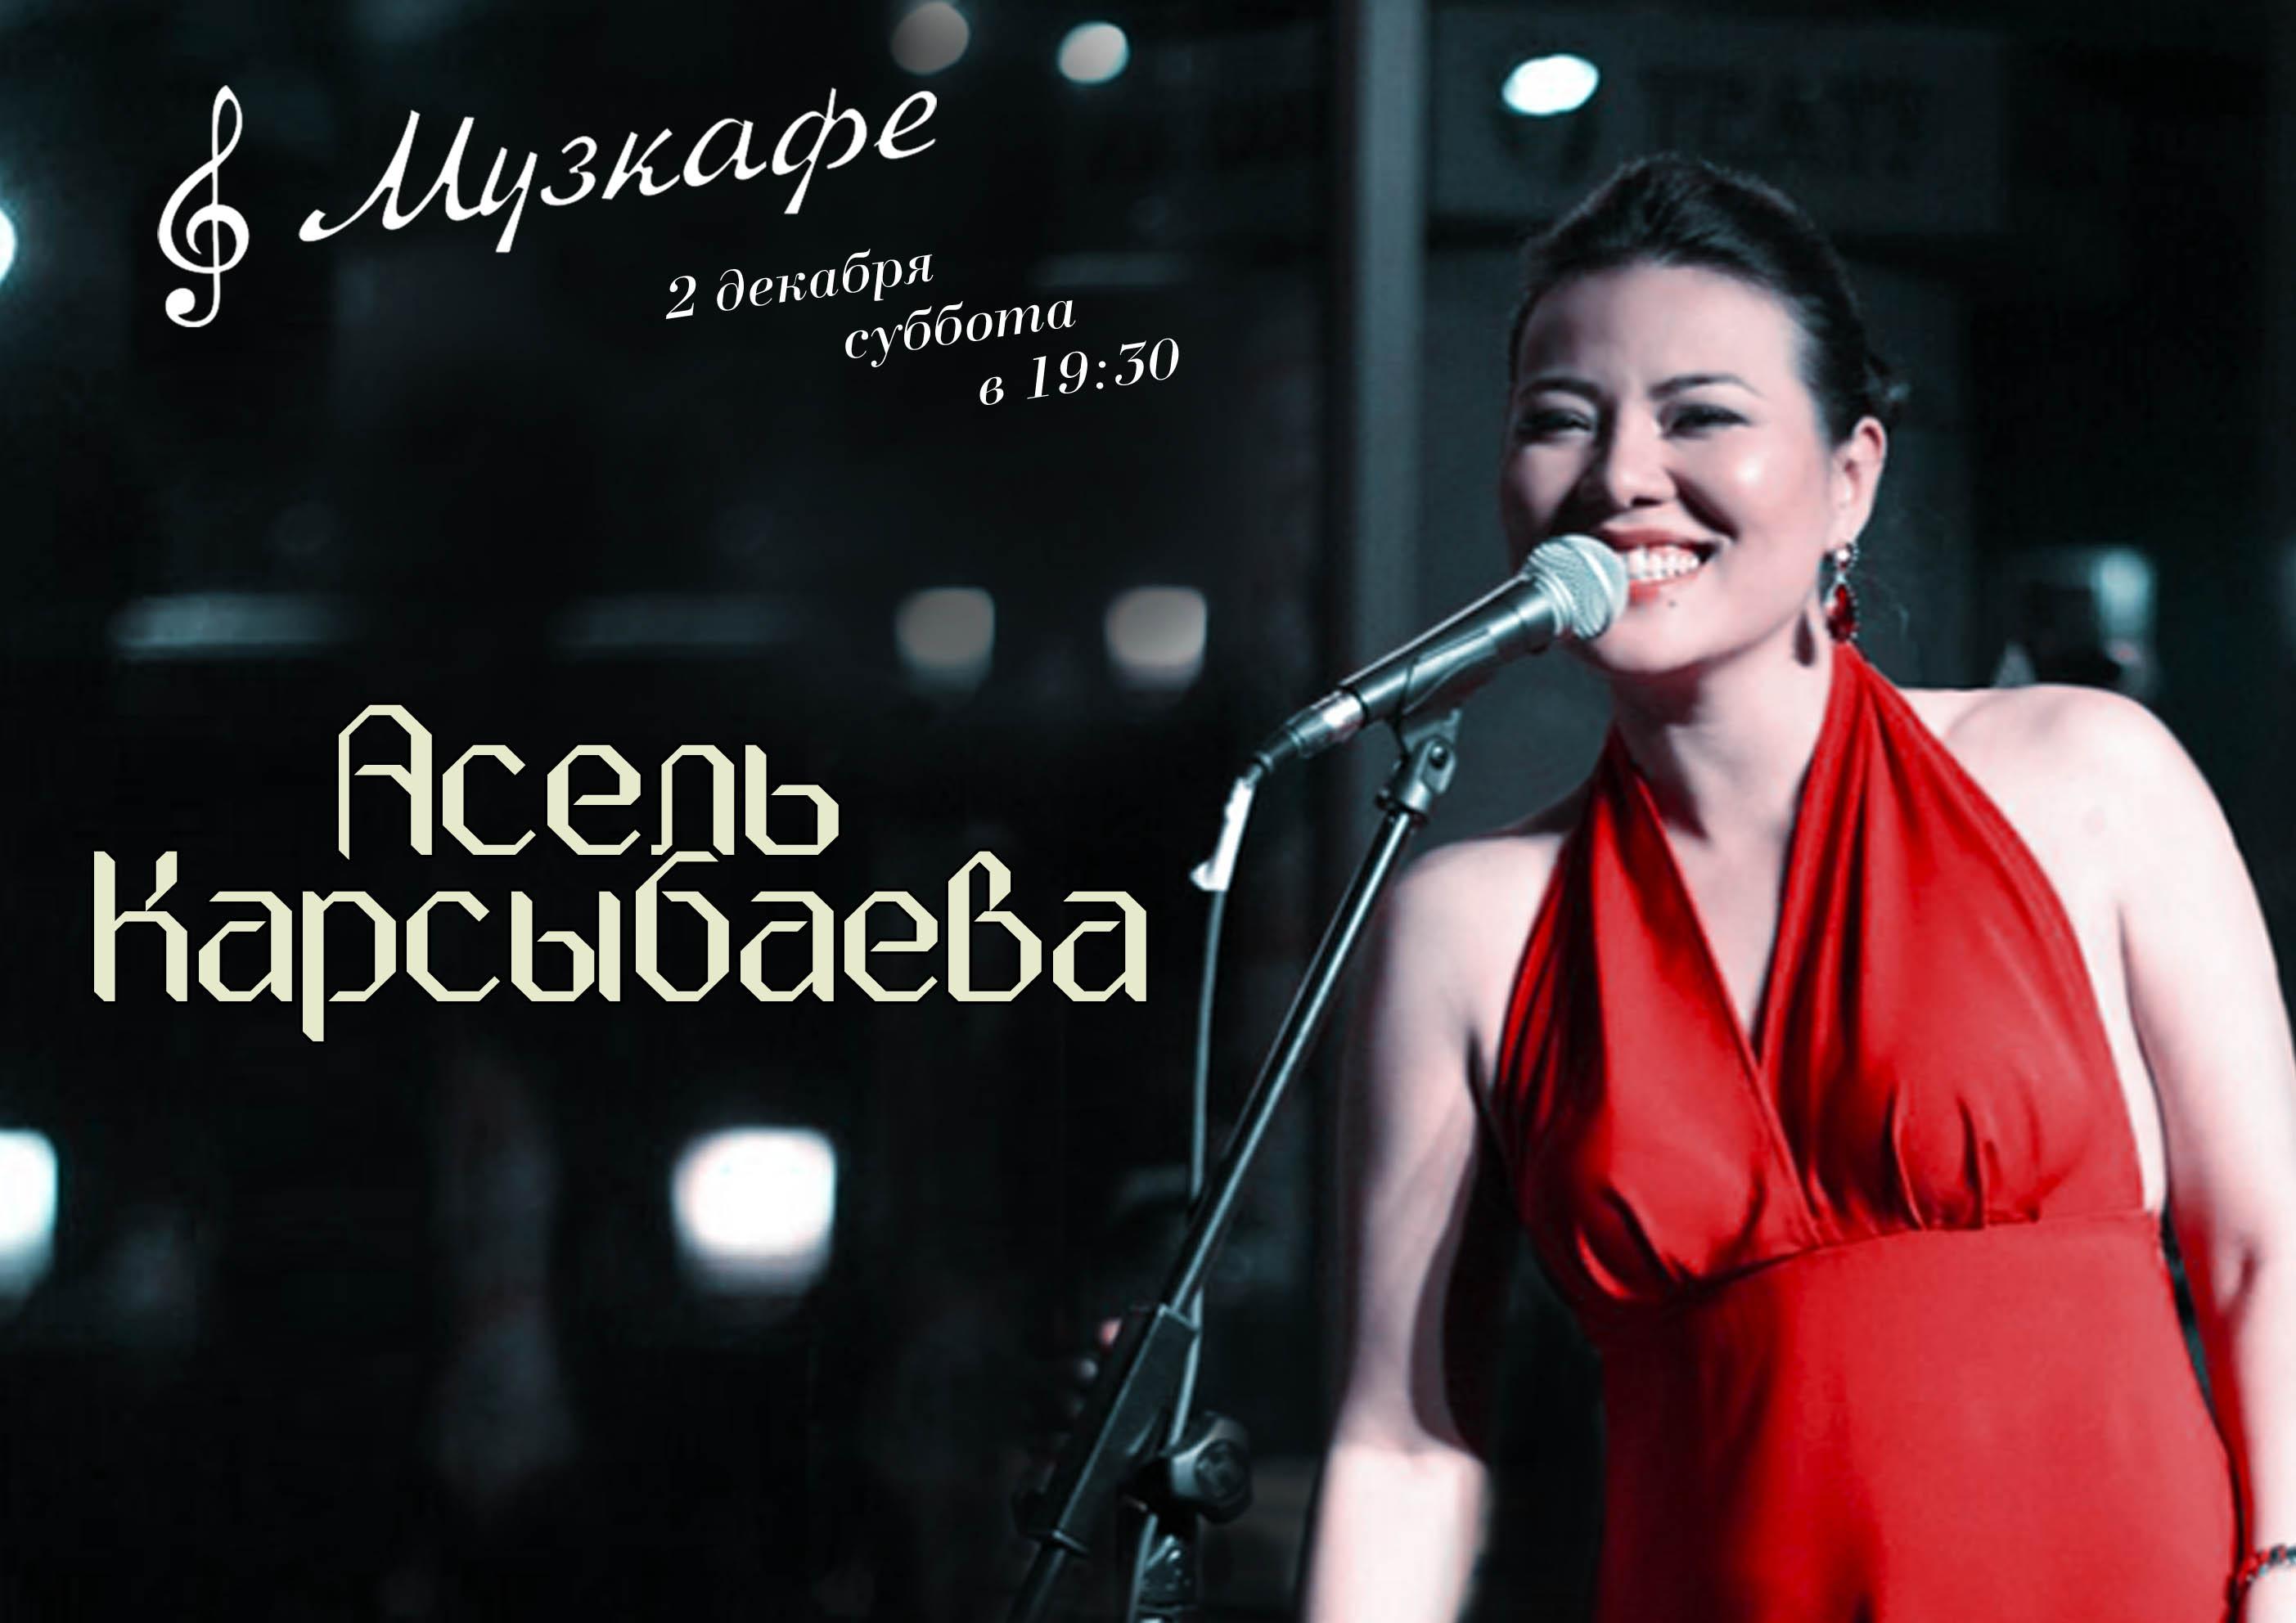 Асель Карсыбаева